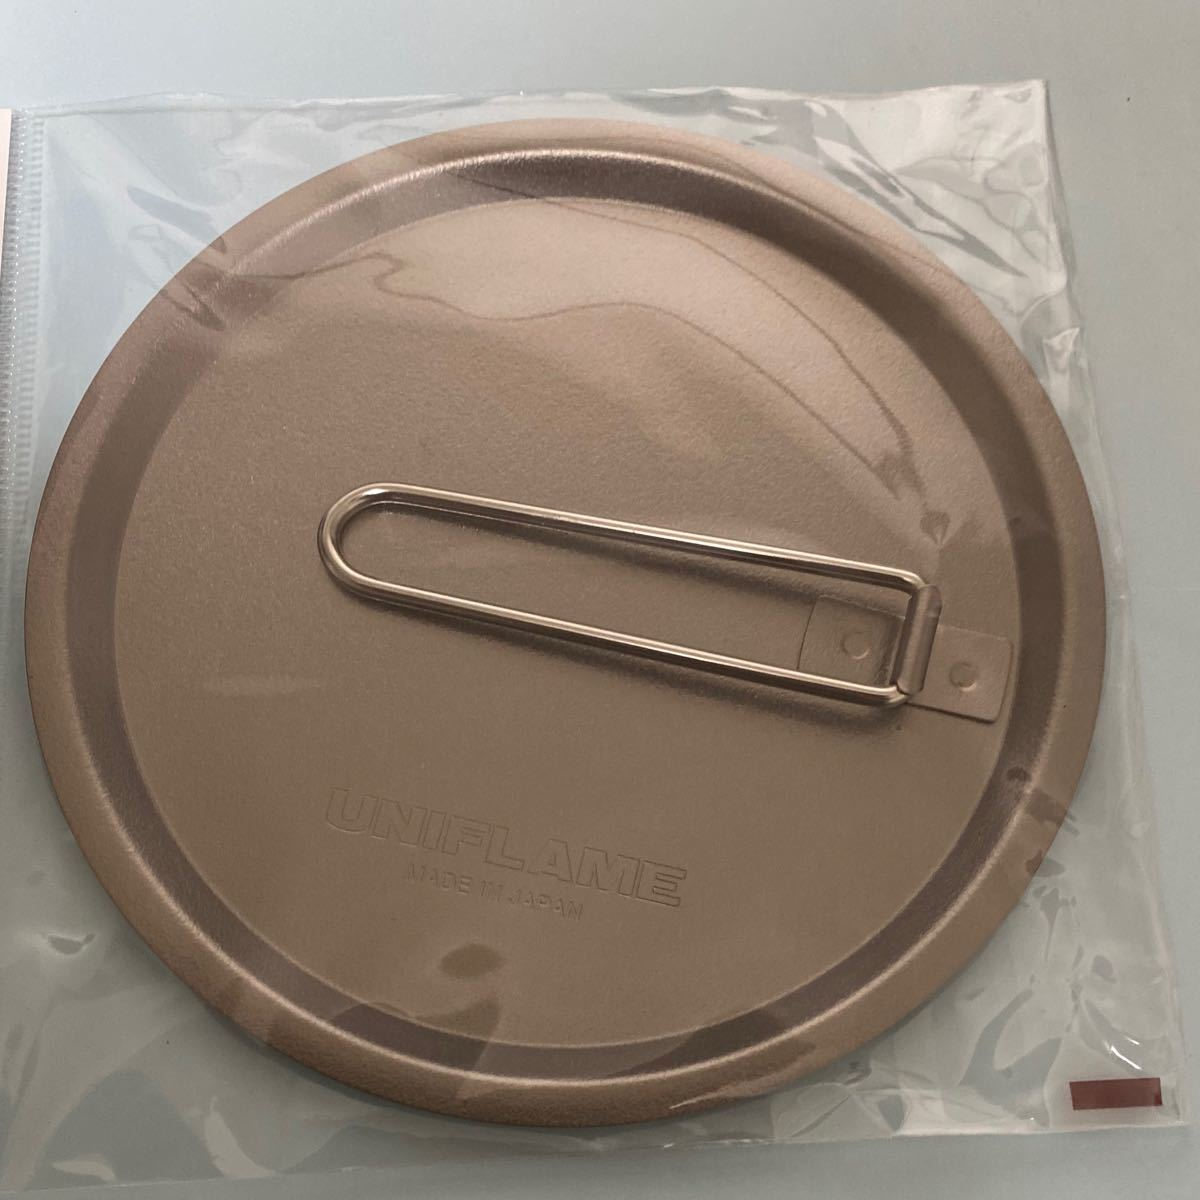 UNIFLAME ユニフレーム シェラリッド 300 チタン 668146  新品未開封 日本製